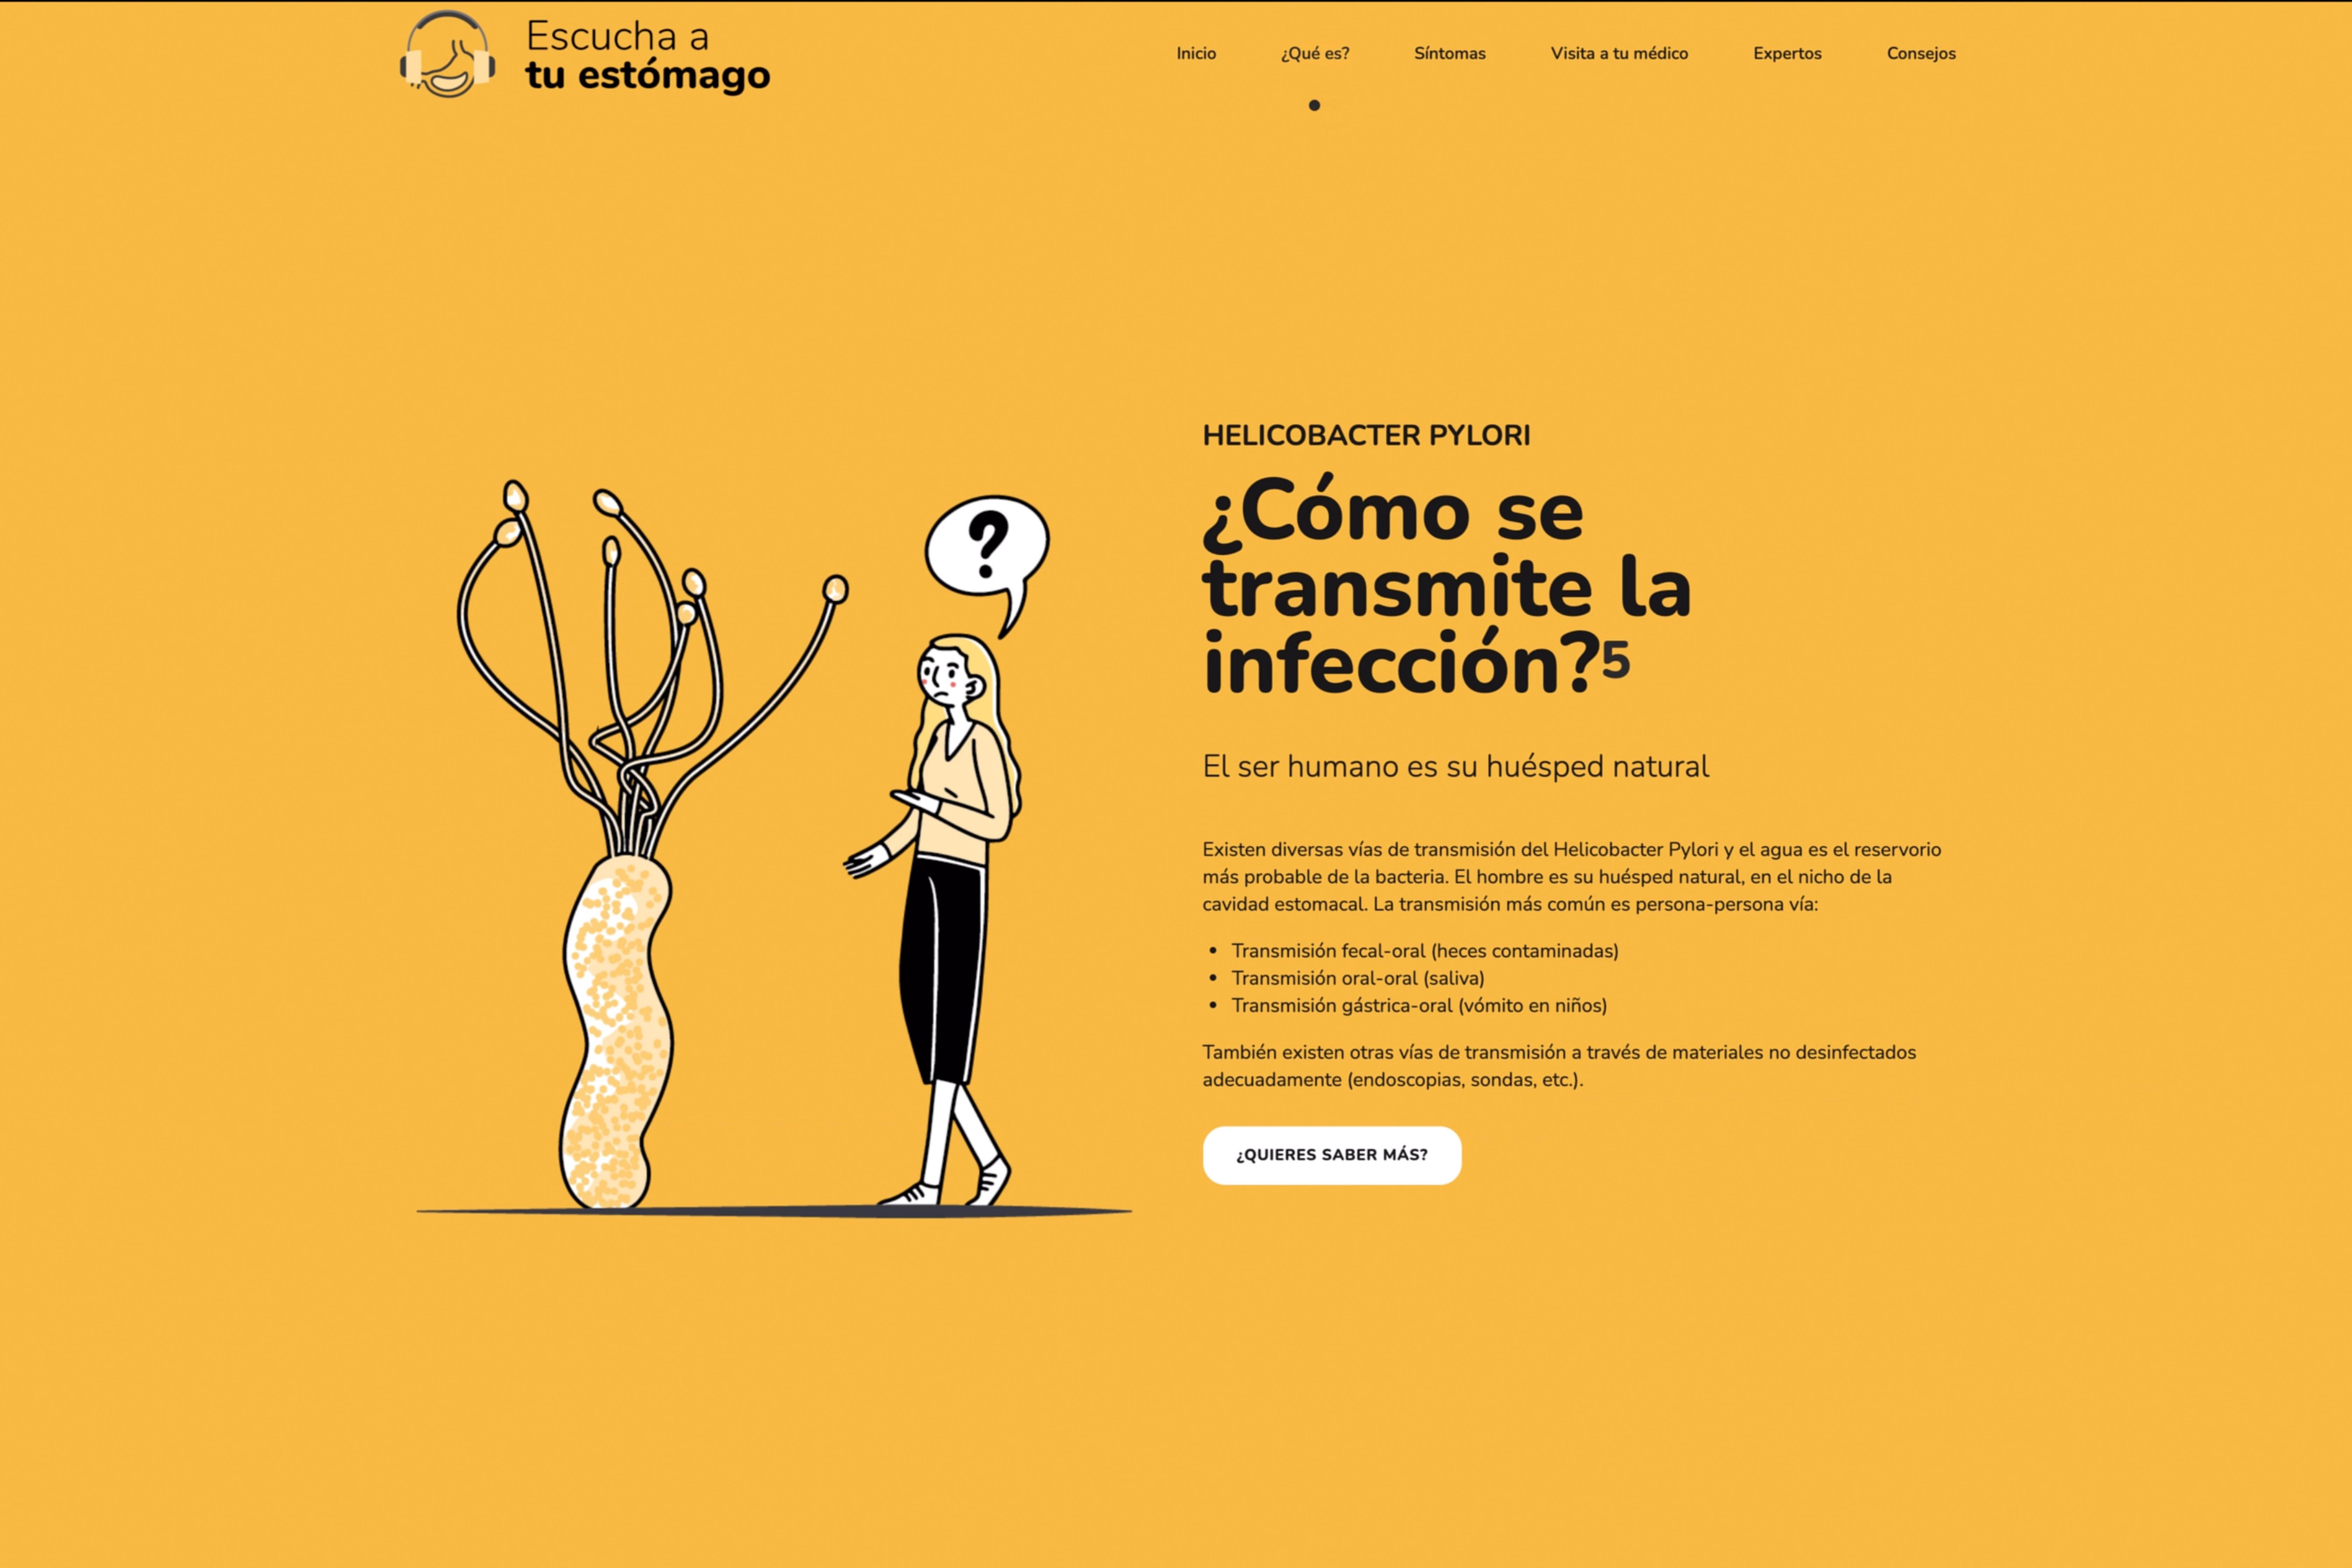 web_escuchatuestomago_2_editat